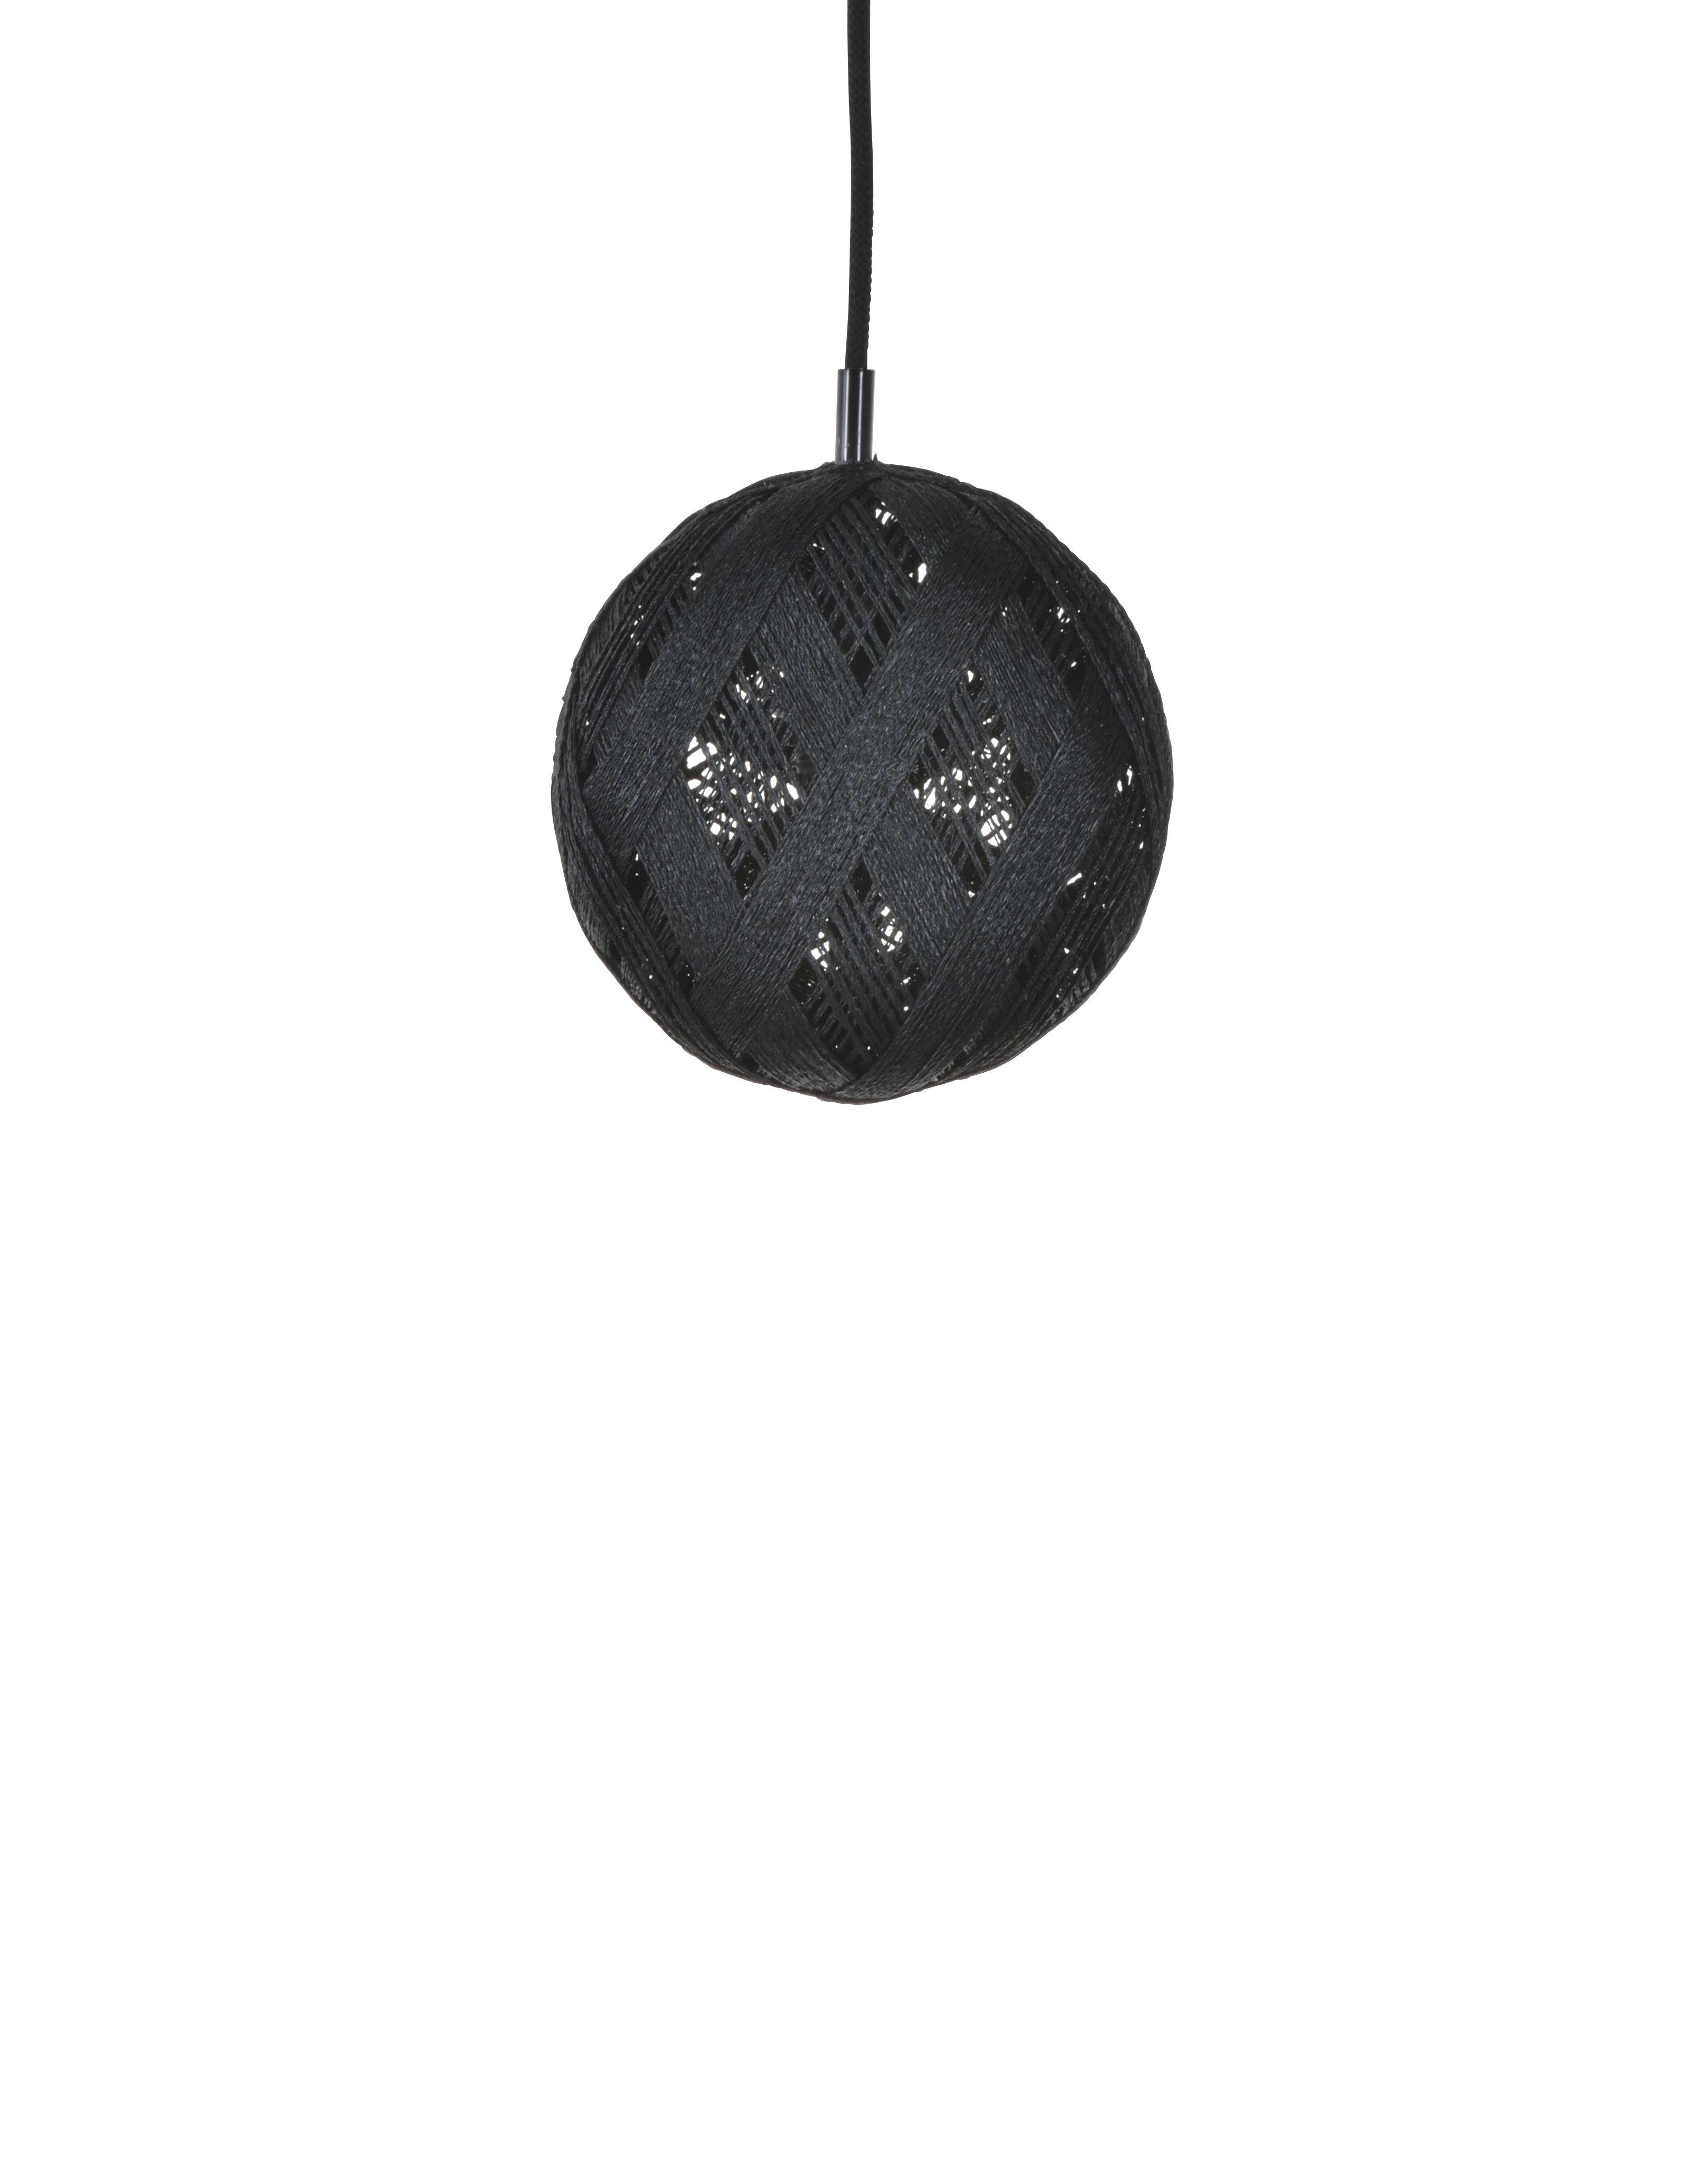 Lighting - Pendant Lighting - Chanpen Hexagon Pendant - Ø  19 cm by Forestier - Black / Triangle patterns - Woven acaba